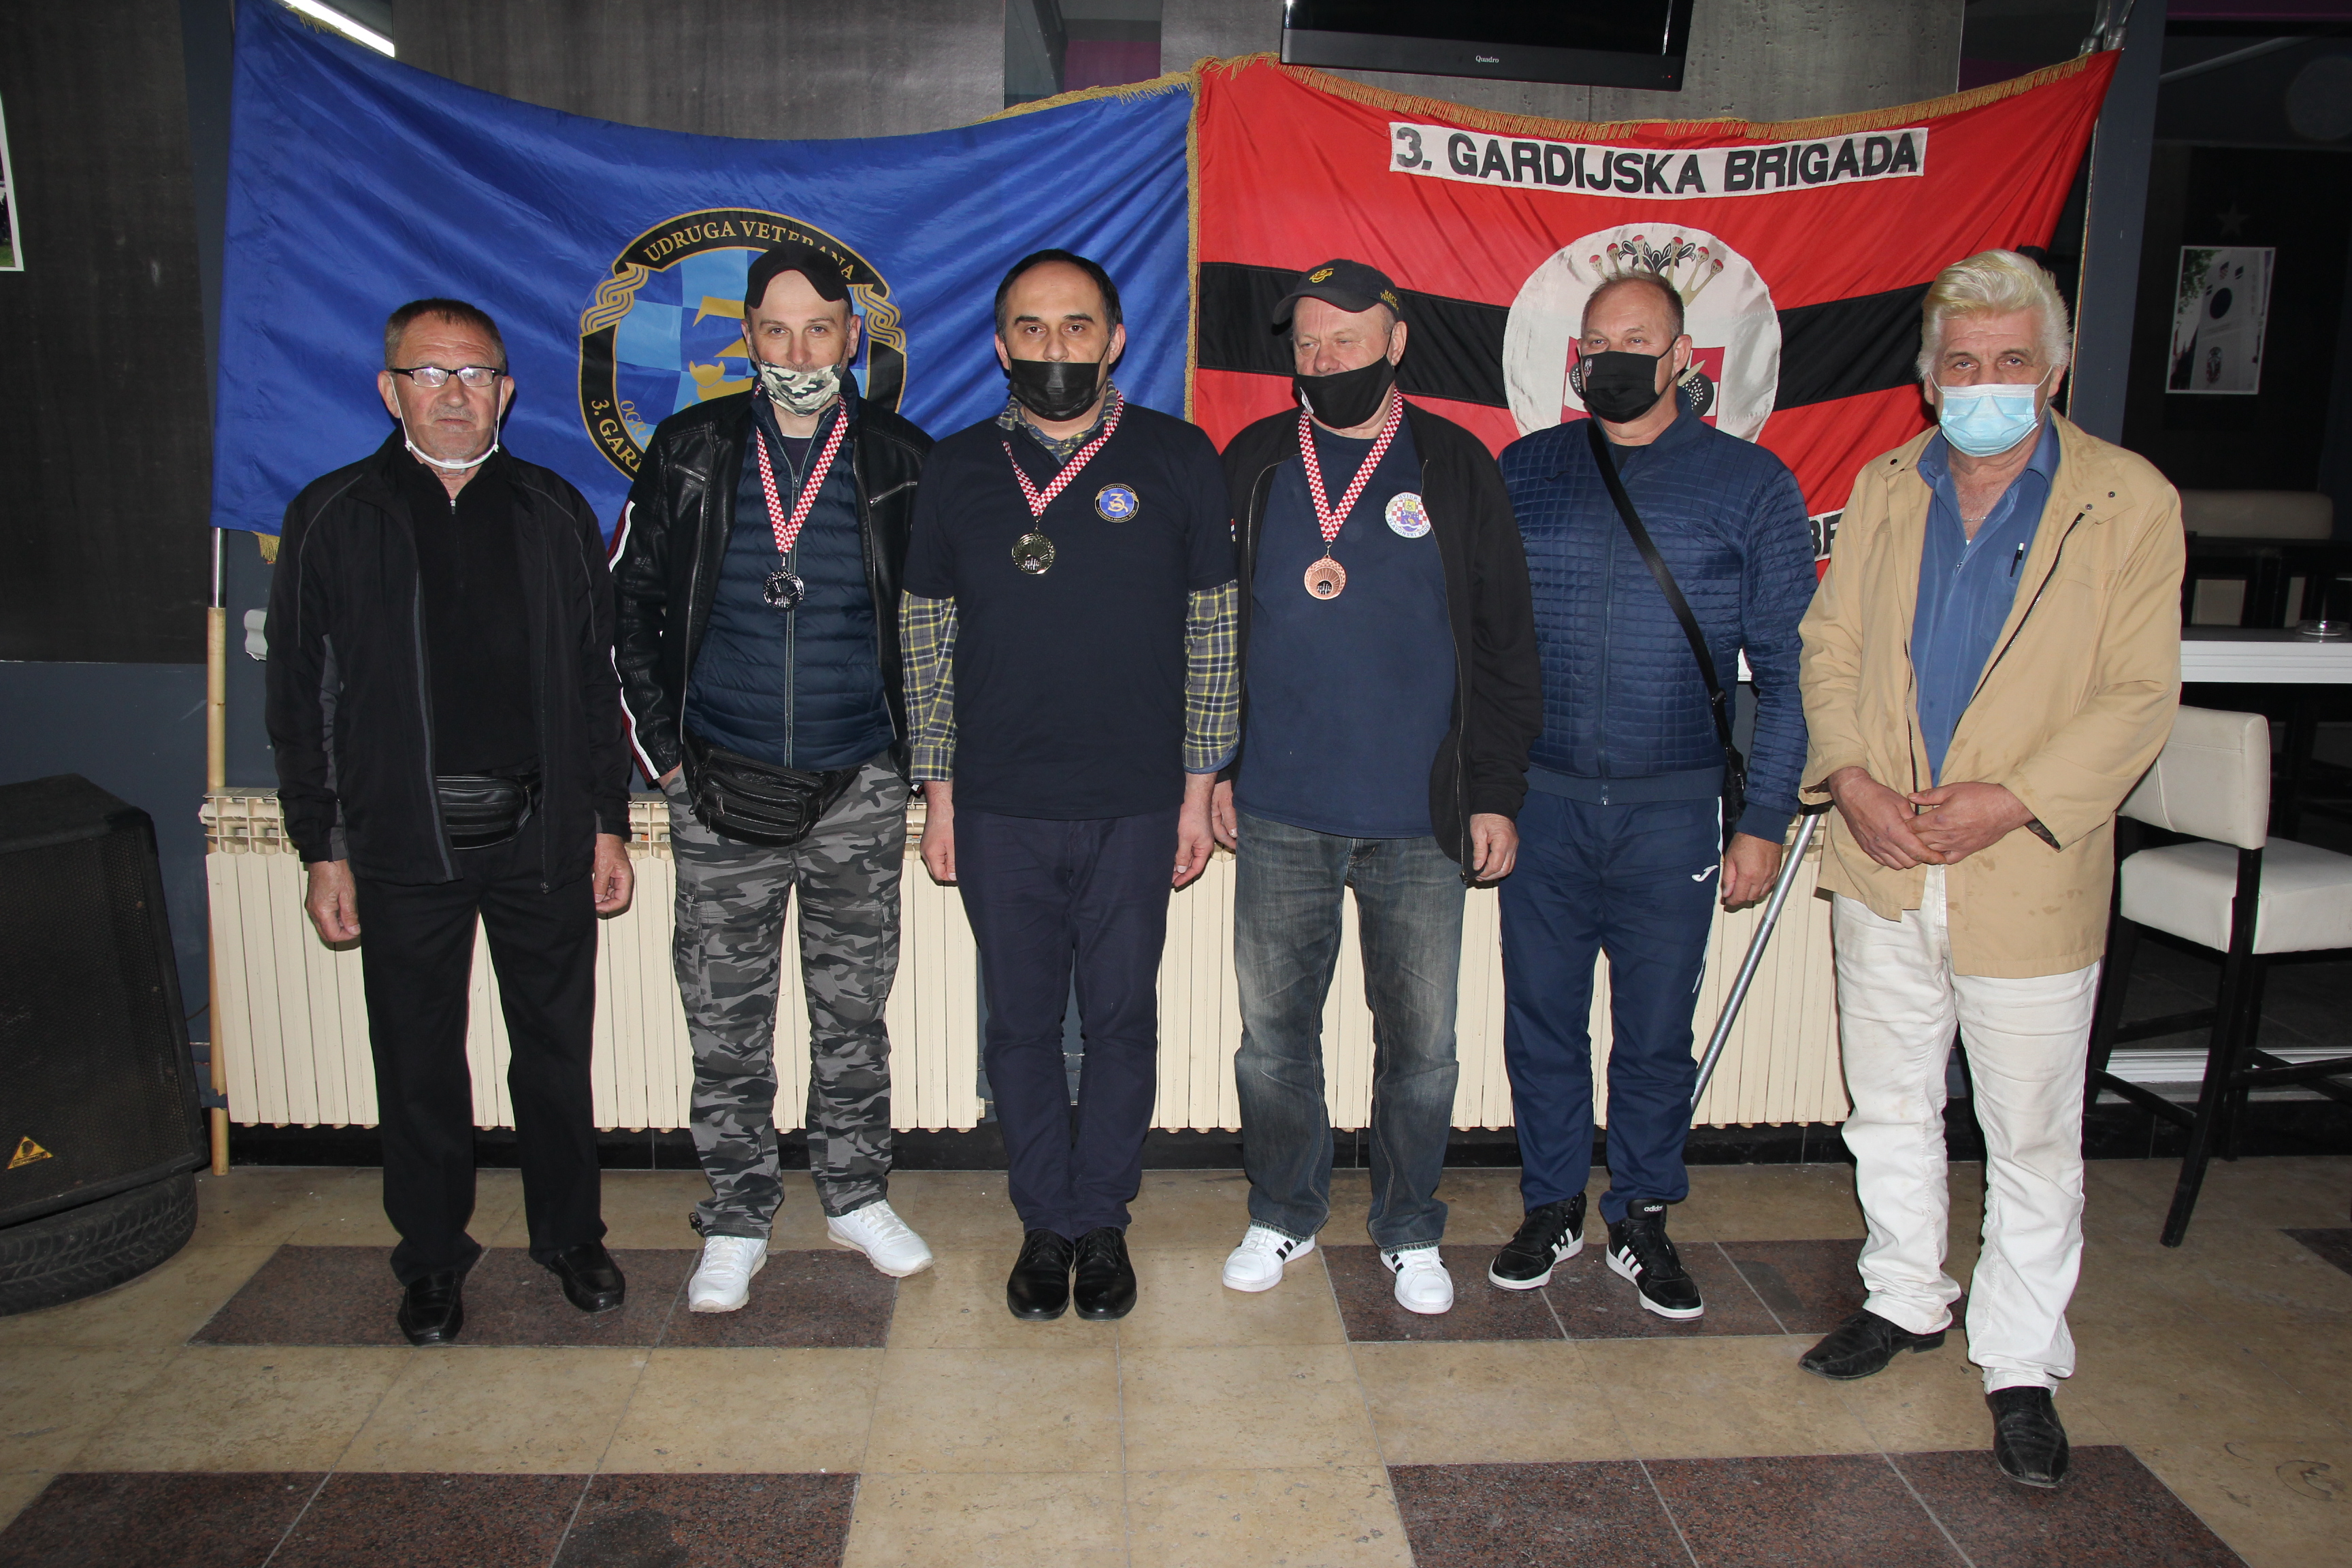 Održan Šahovski turnir povodom 30. godišnjice 3. Gardijske brigade Veterana Kune